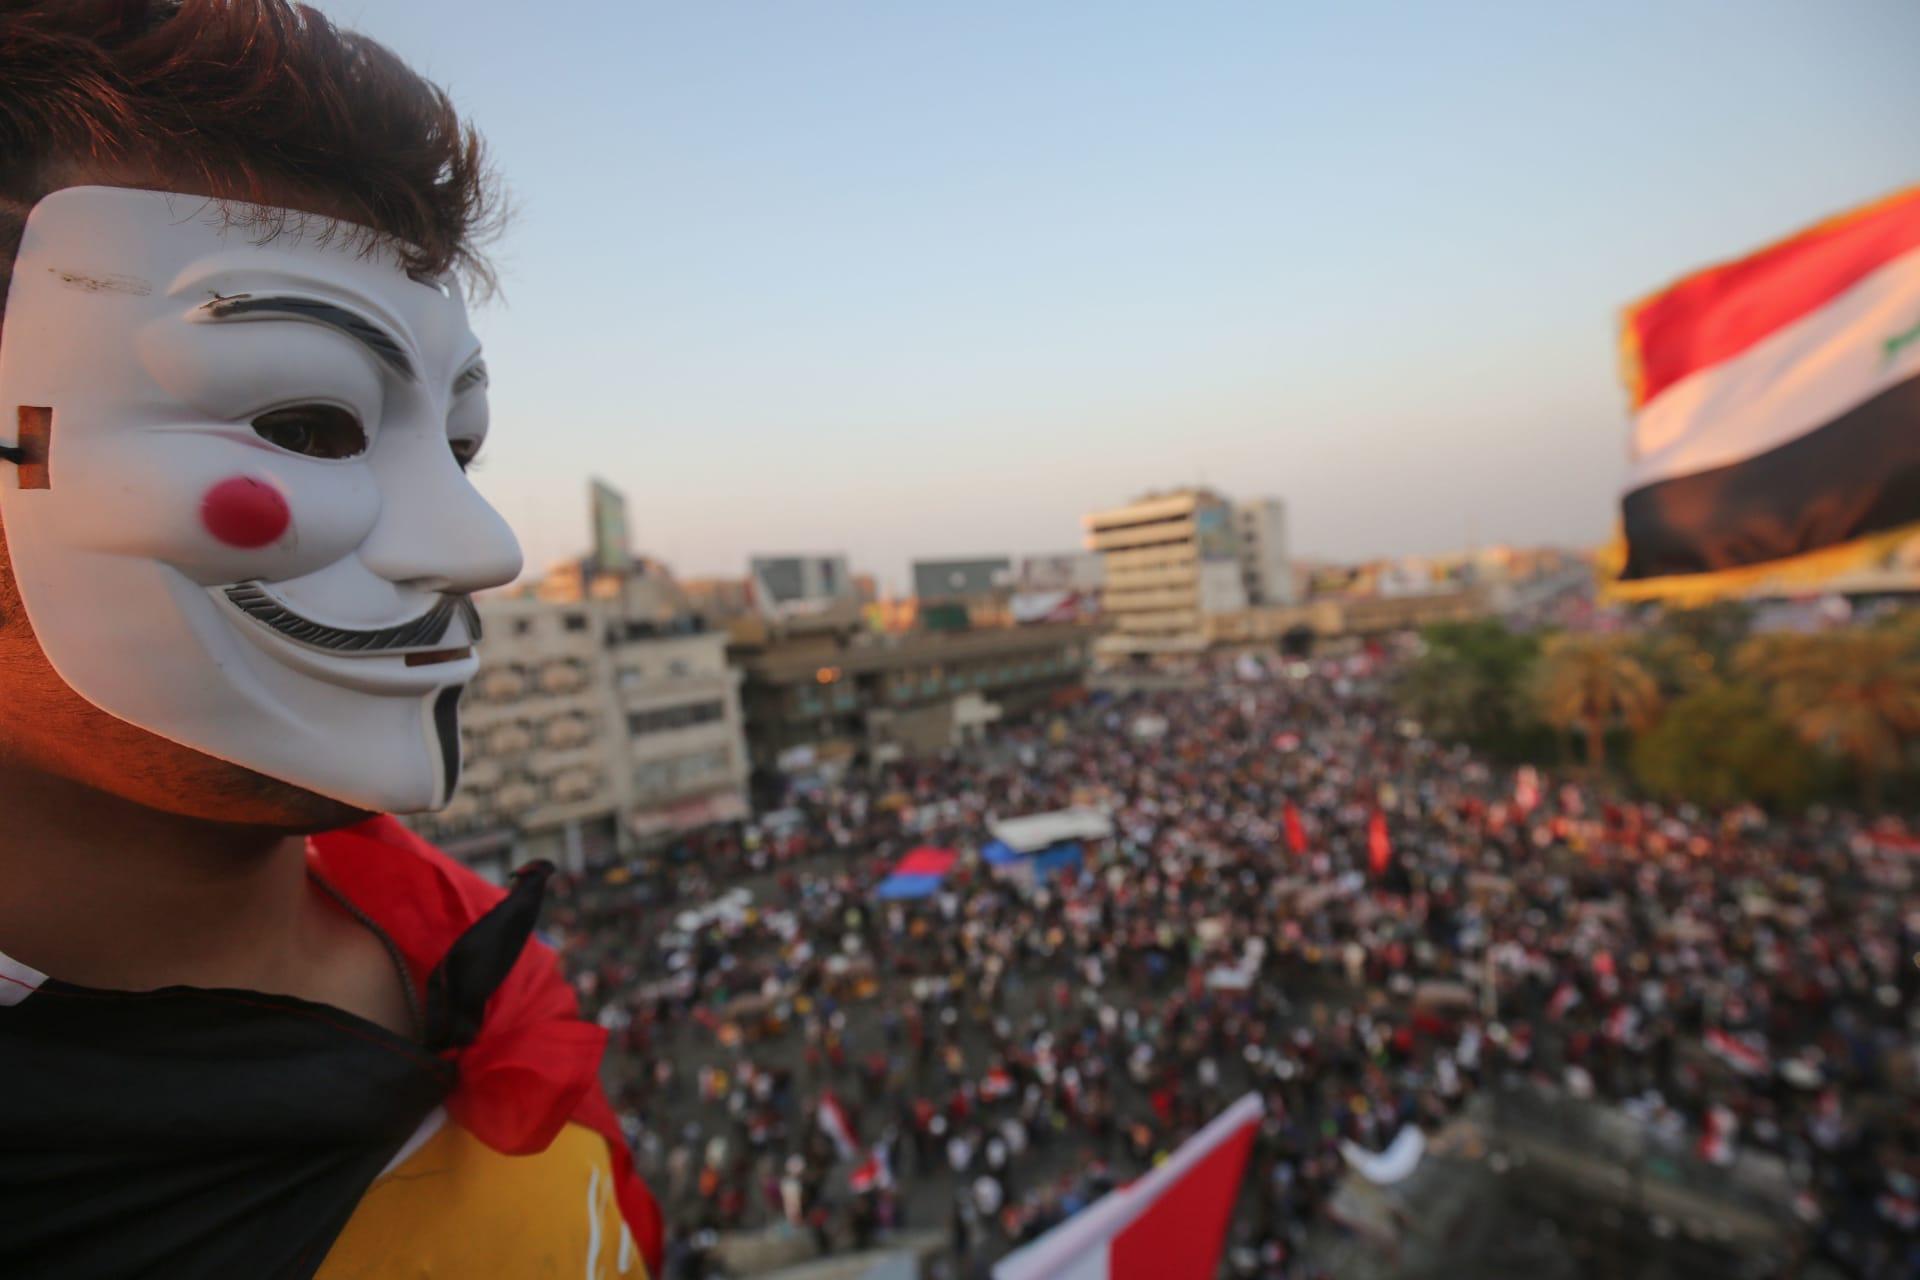 بالصور.. بغداد تشهد أكبر مظاهراتها منذ بدء الاحتجاجات